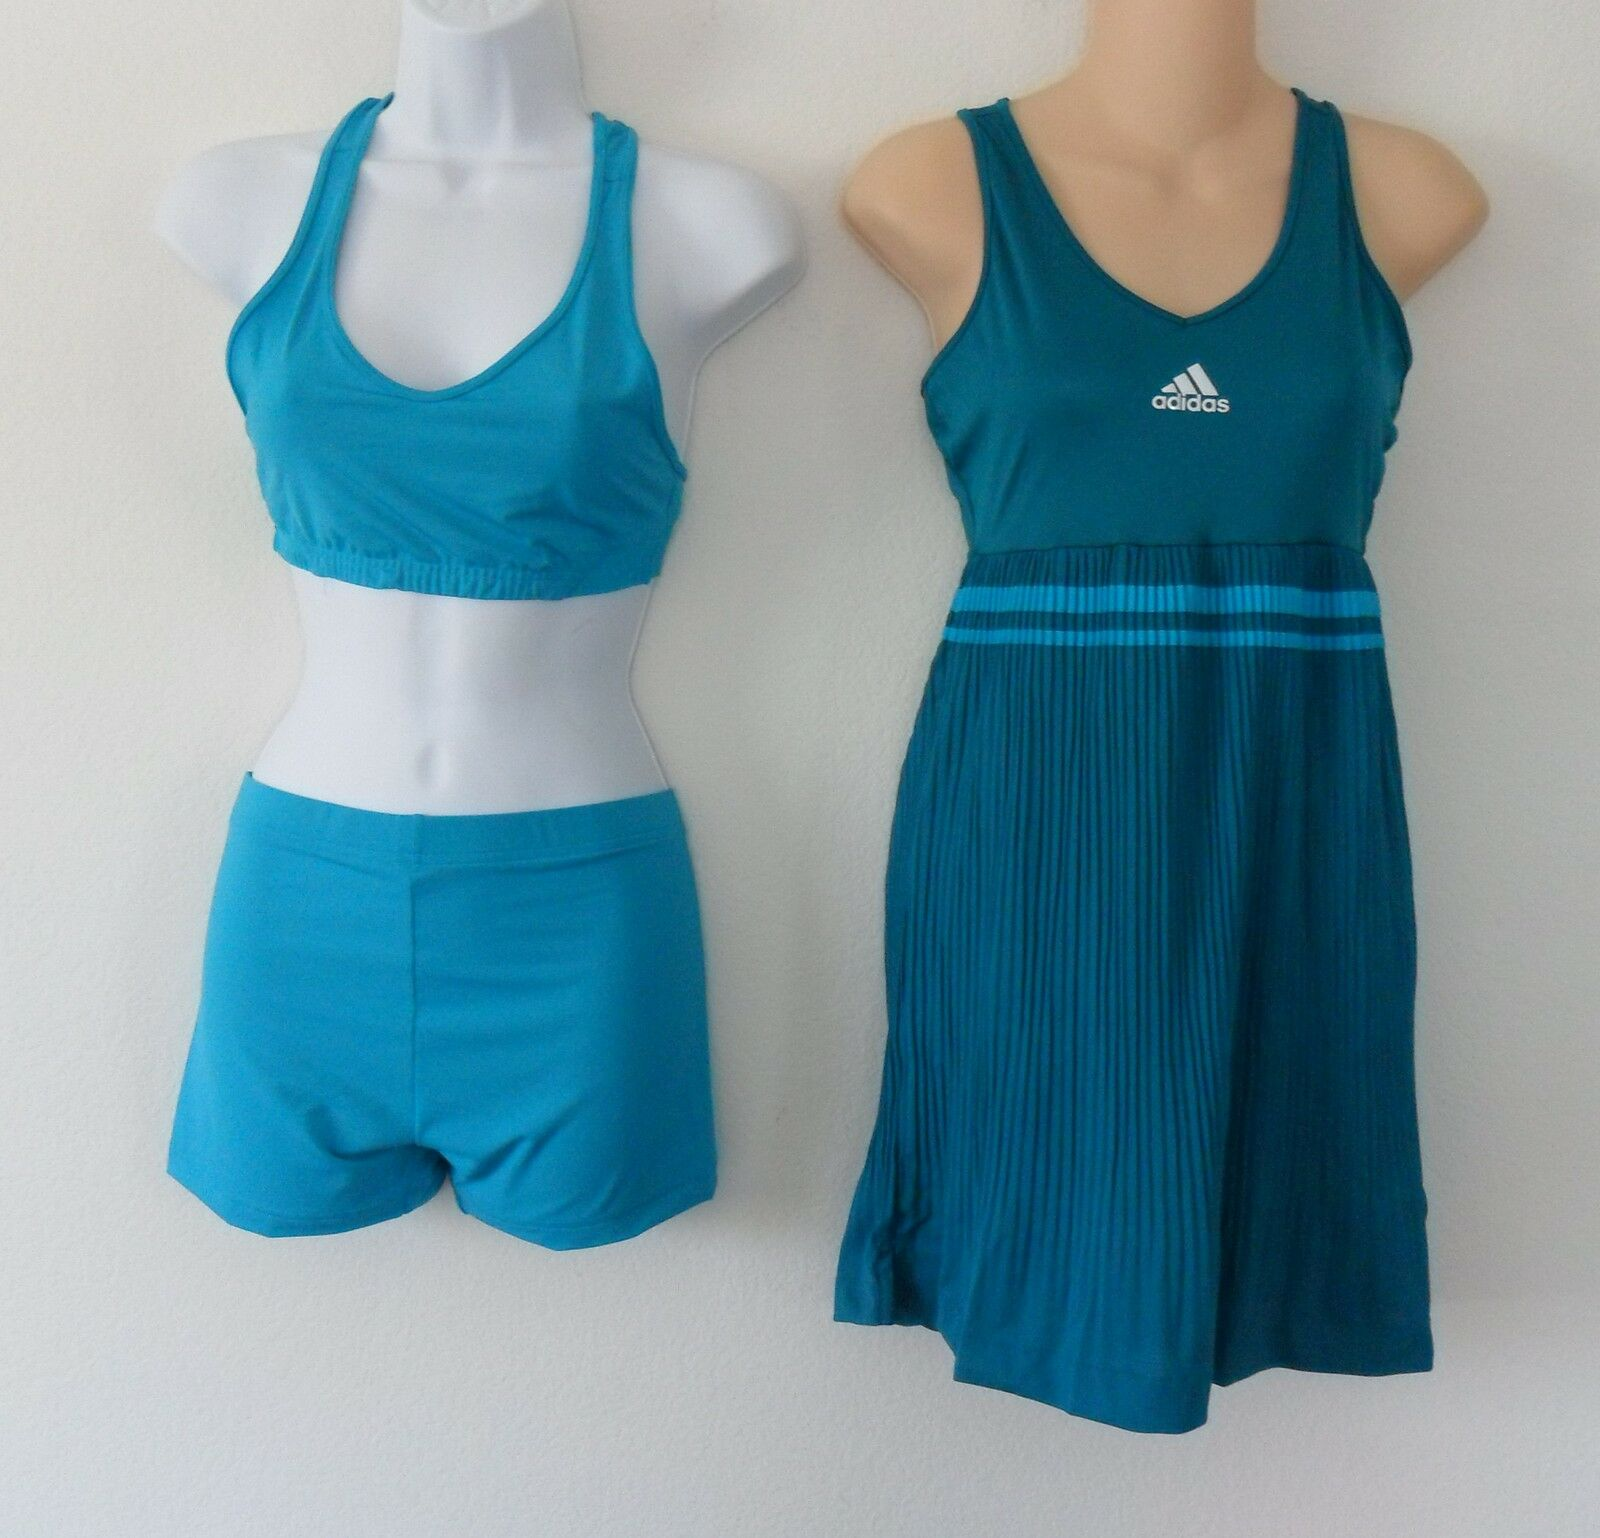 Adidas ADIPURE PLEAT Formotion DRESS skirt Tennis SHORT TIGHT-BRA Top shirtSz S